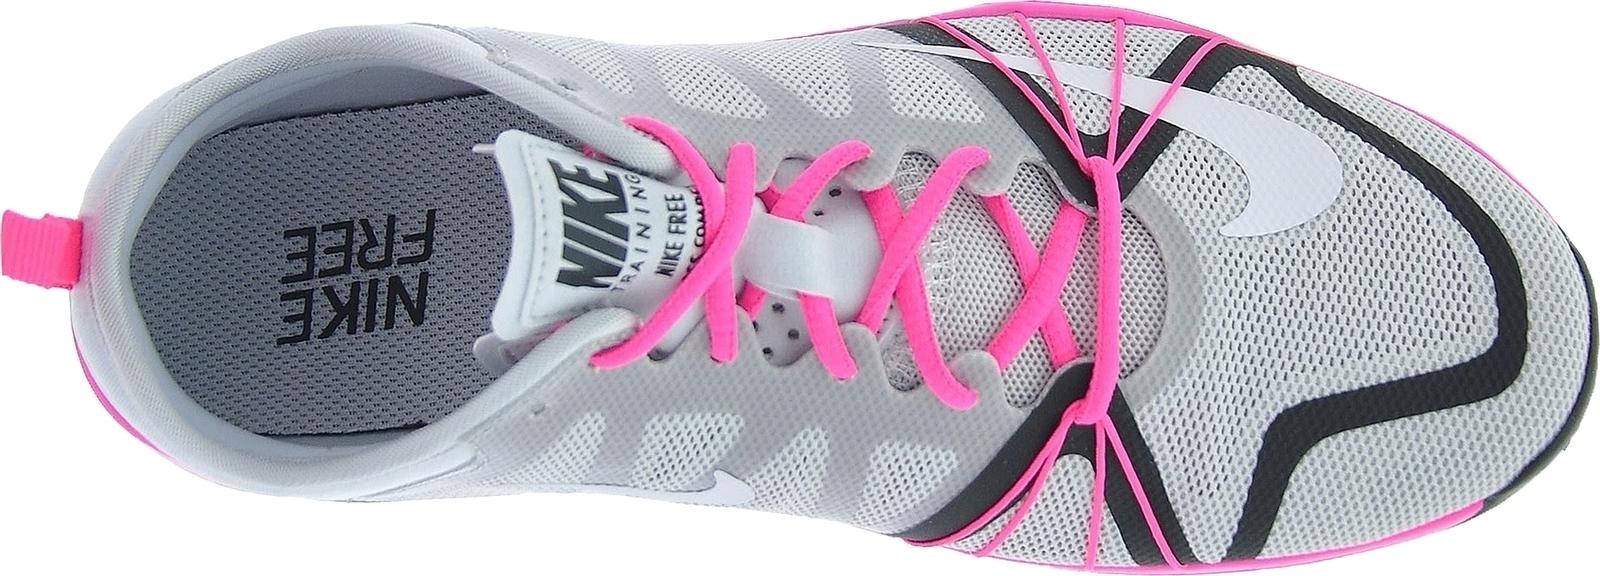 Nike Free Cross Compete 749421-003 - Skroutz.gr 034abf04846